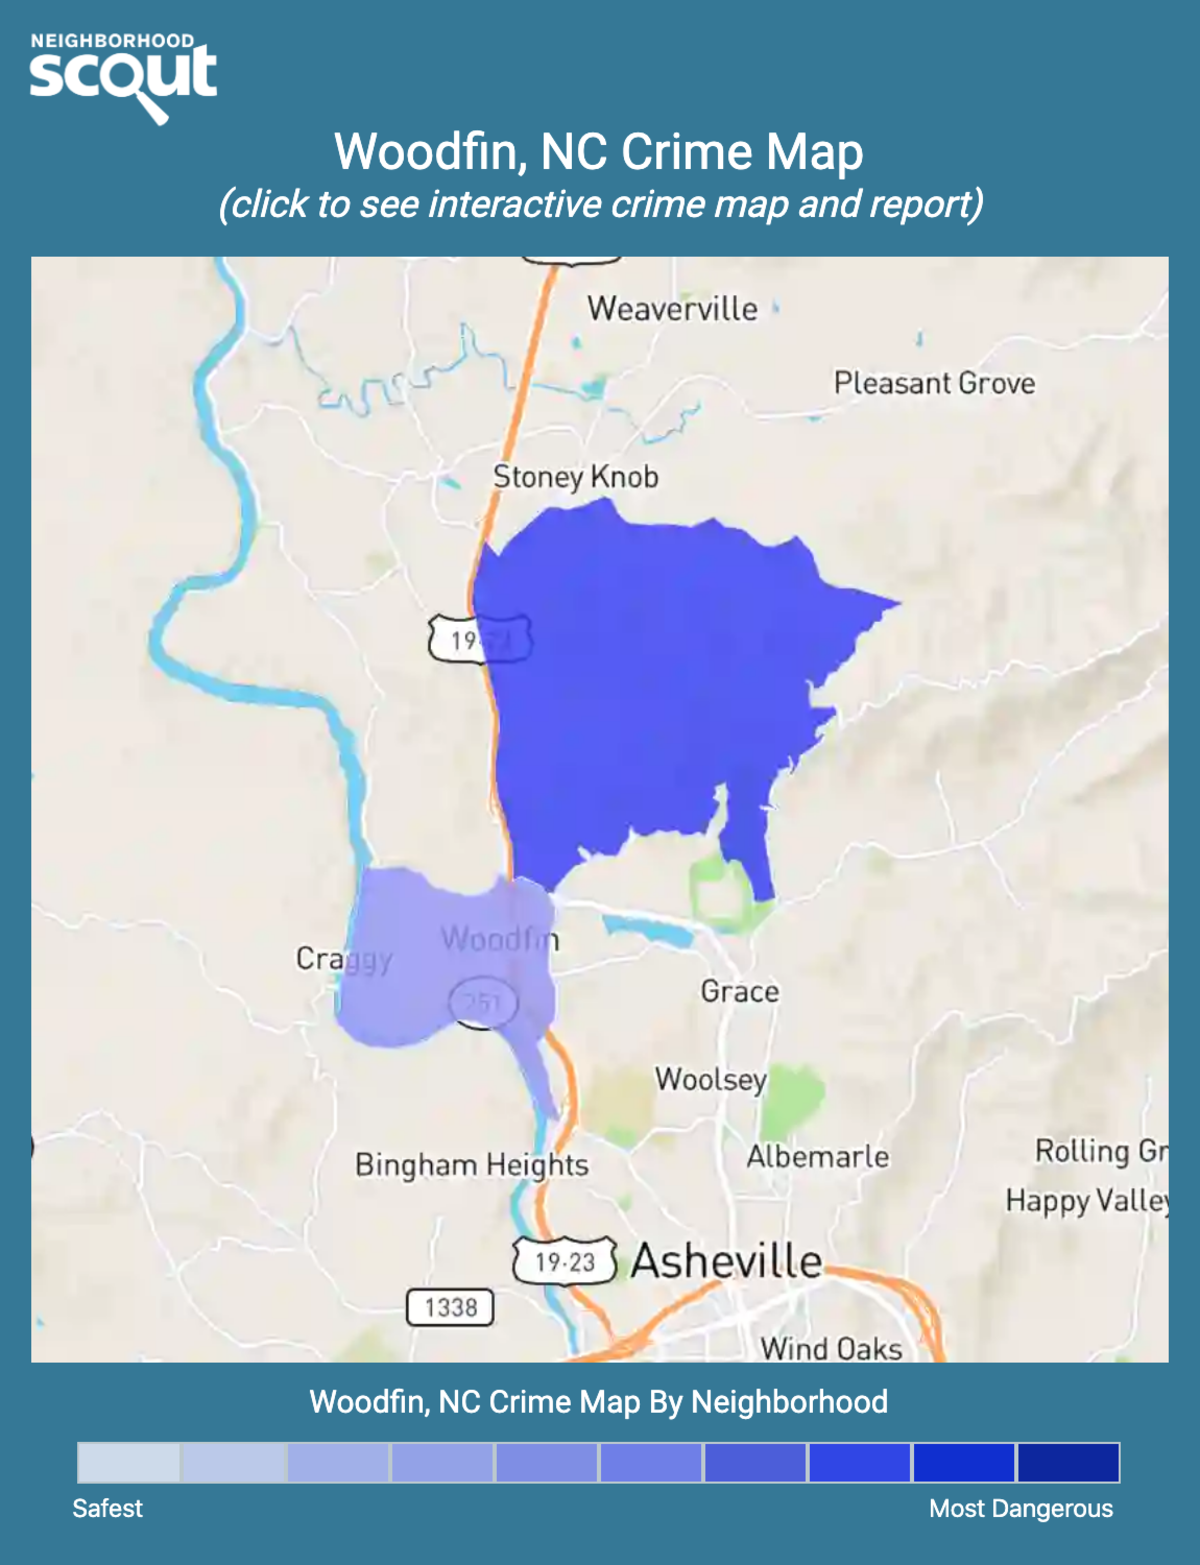 Woodfin, North Carolina crime map